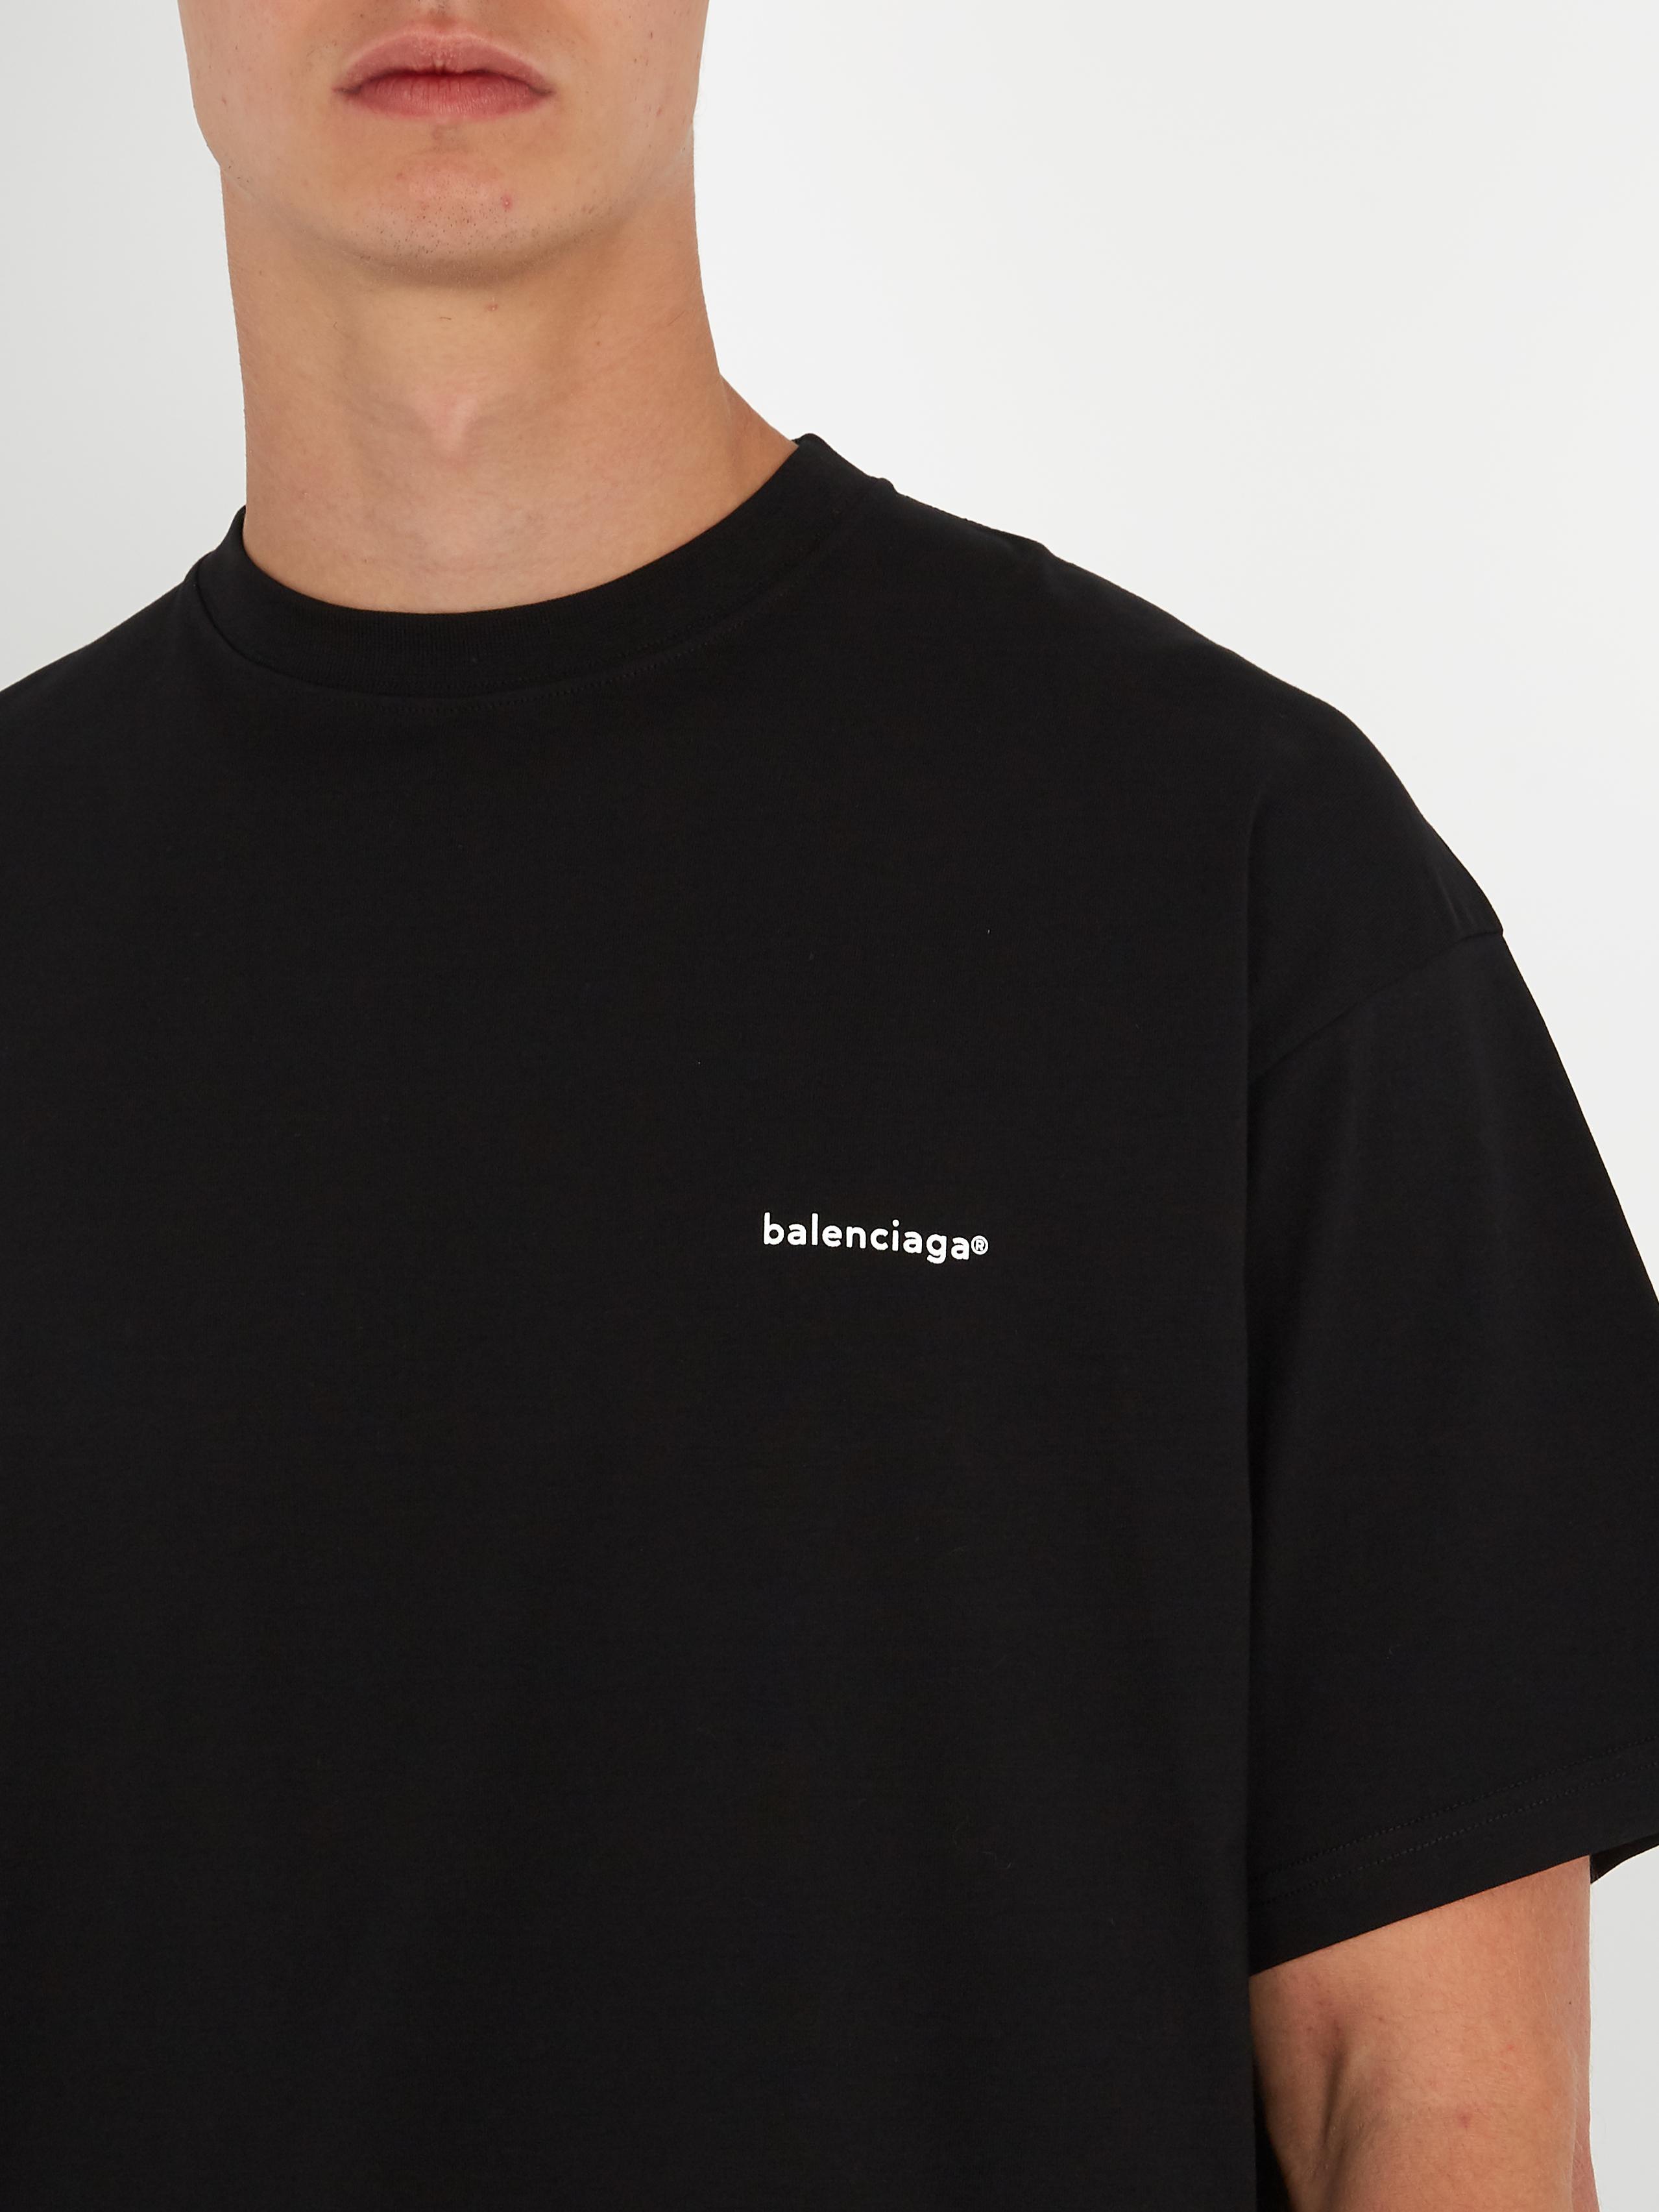 Lyst Balenciaga Oversized Logo Print Cotton T Shirt In Black For Men